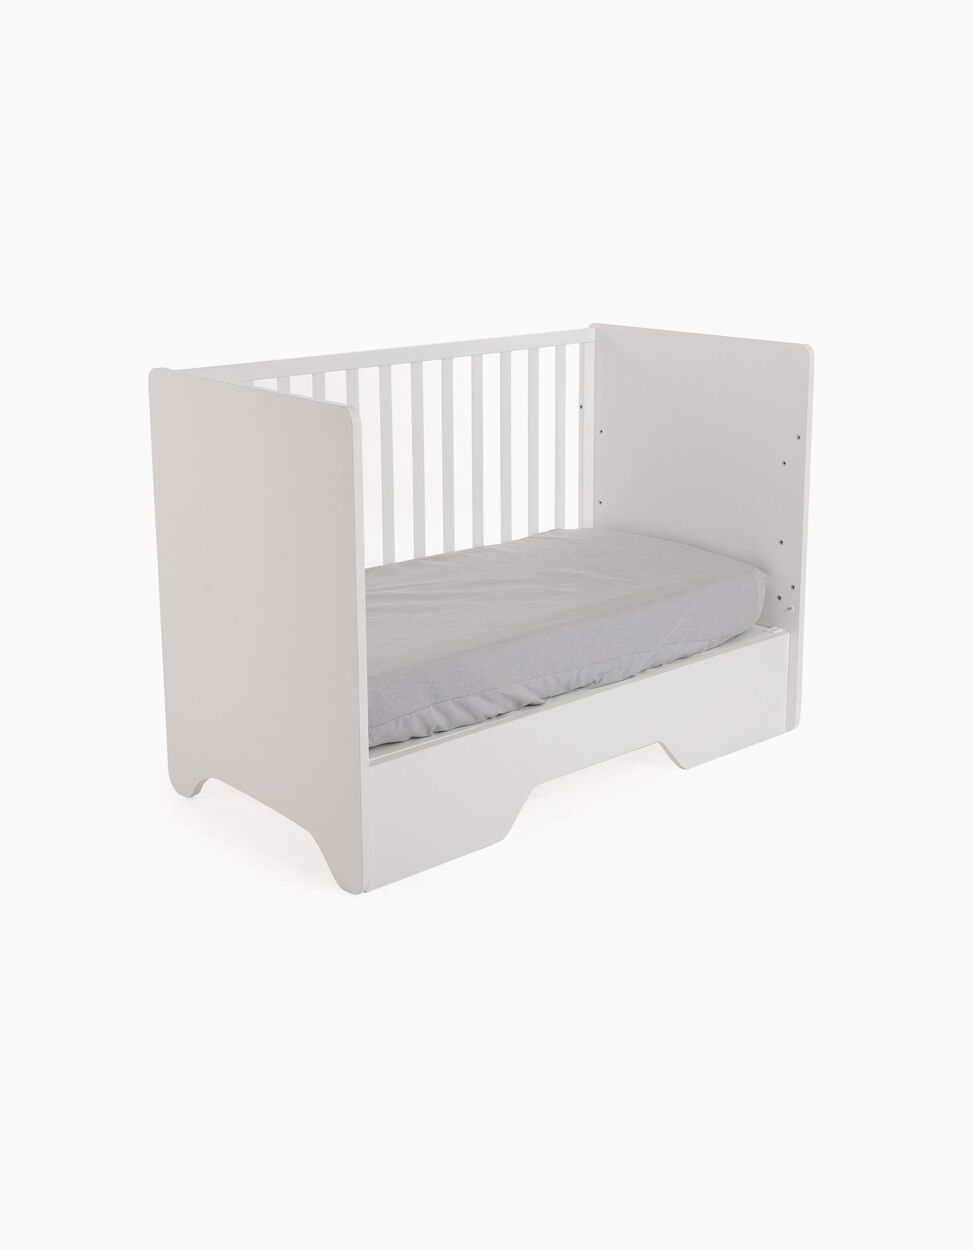 Cama 5 em 1, 120x60 cm Zy Baby